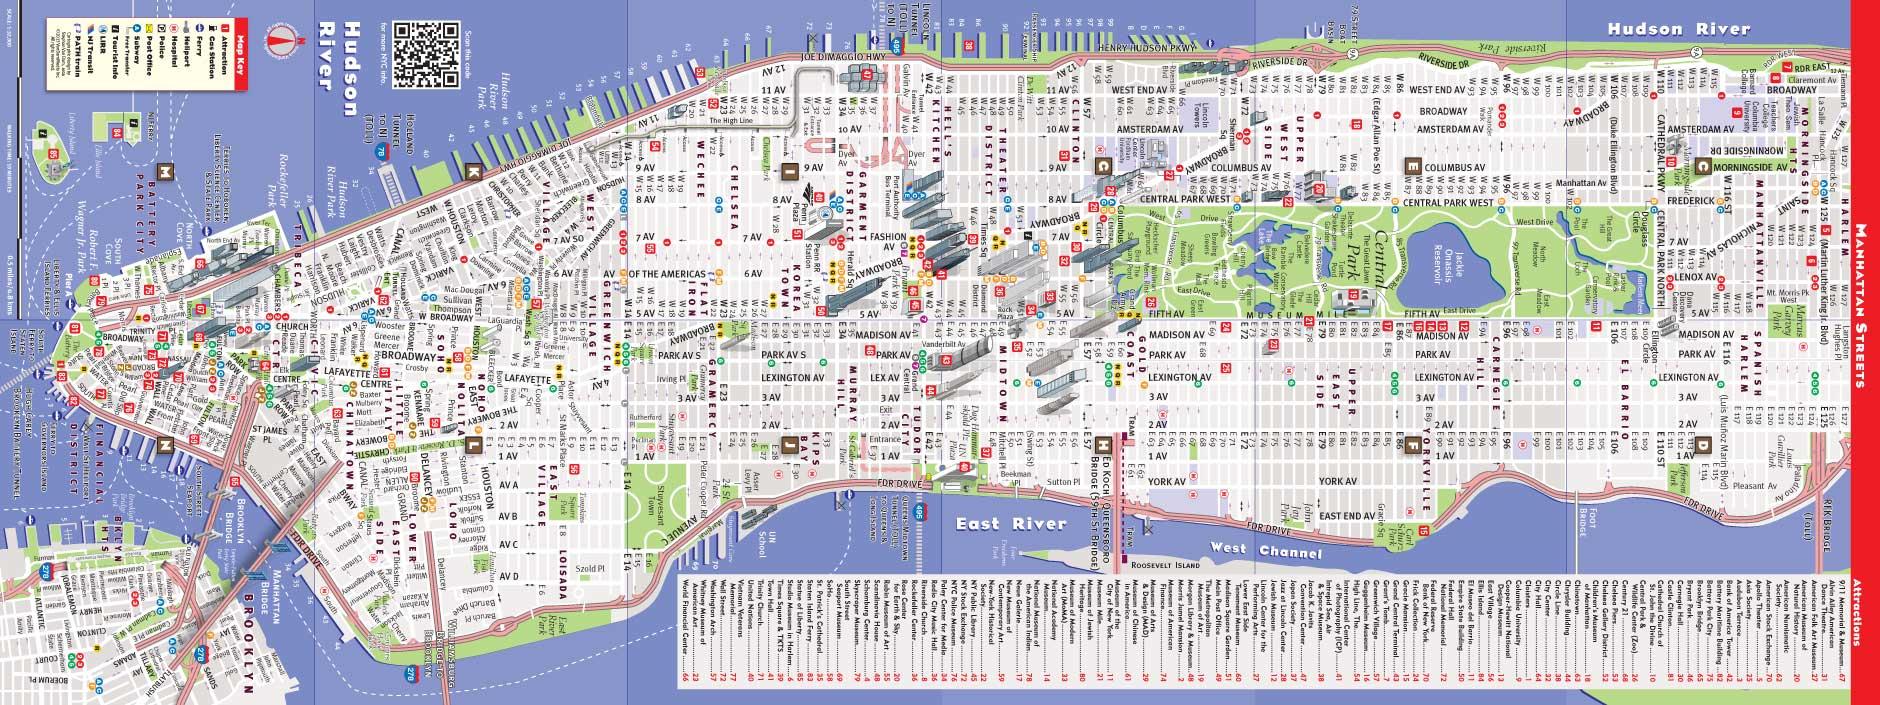 Printable New York Street Map   Travel Maps And Major Tourist - Printable New York Street Map